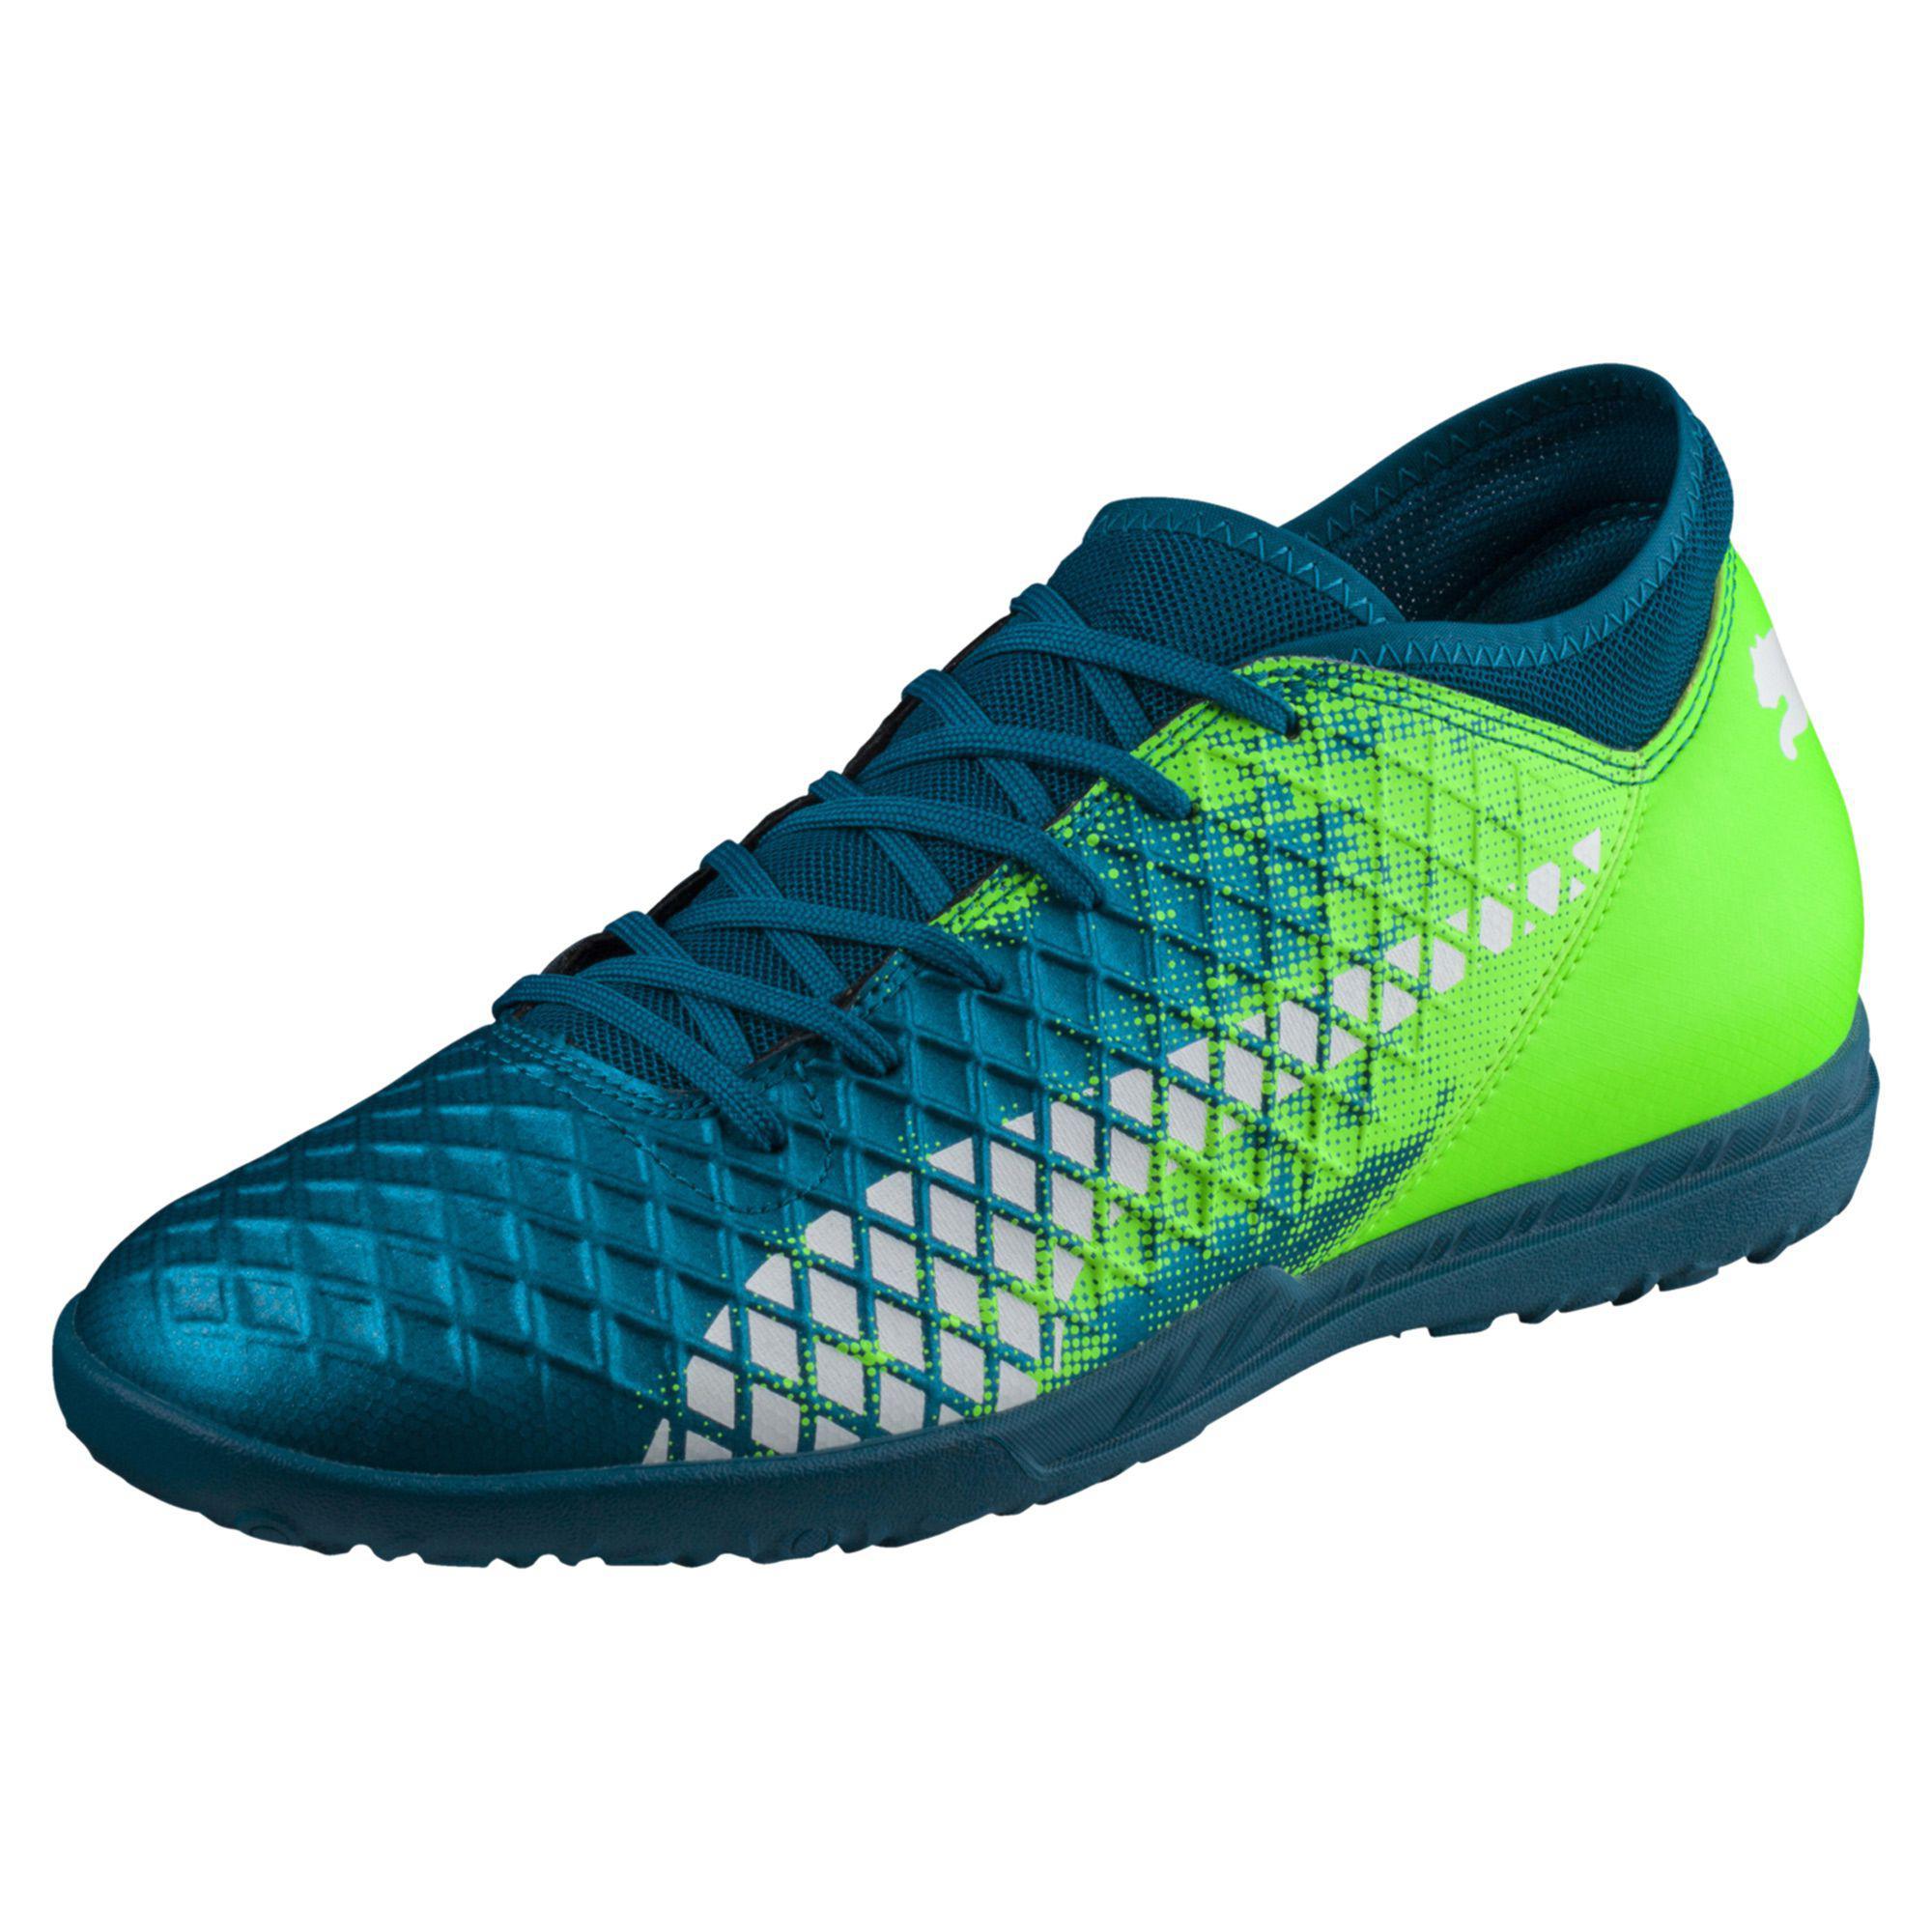 39d440930 PUMA Future 18.4 Tt Men s Soccer Cleats in Green for Men - Lyst